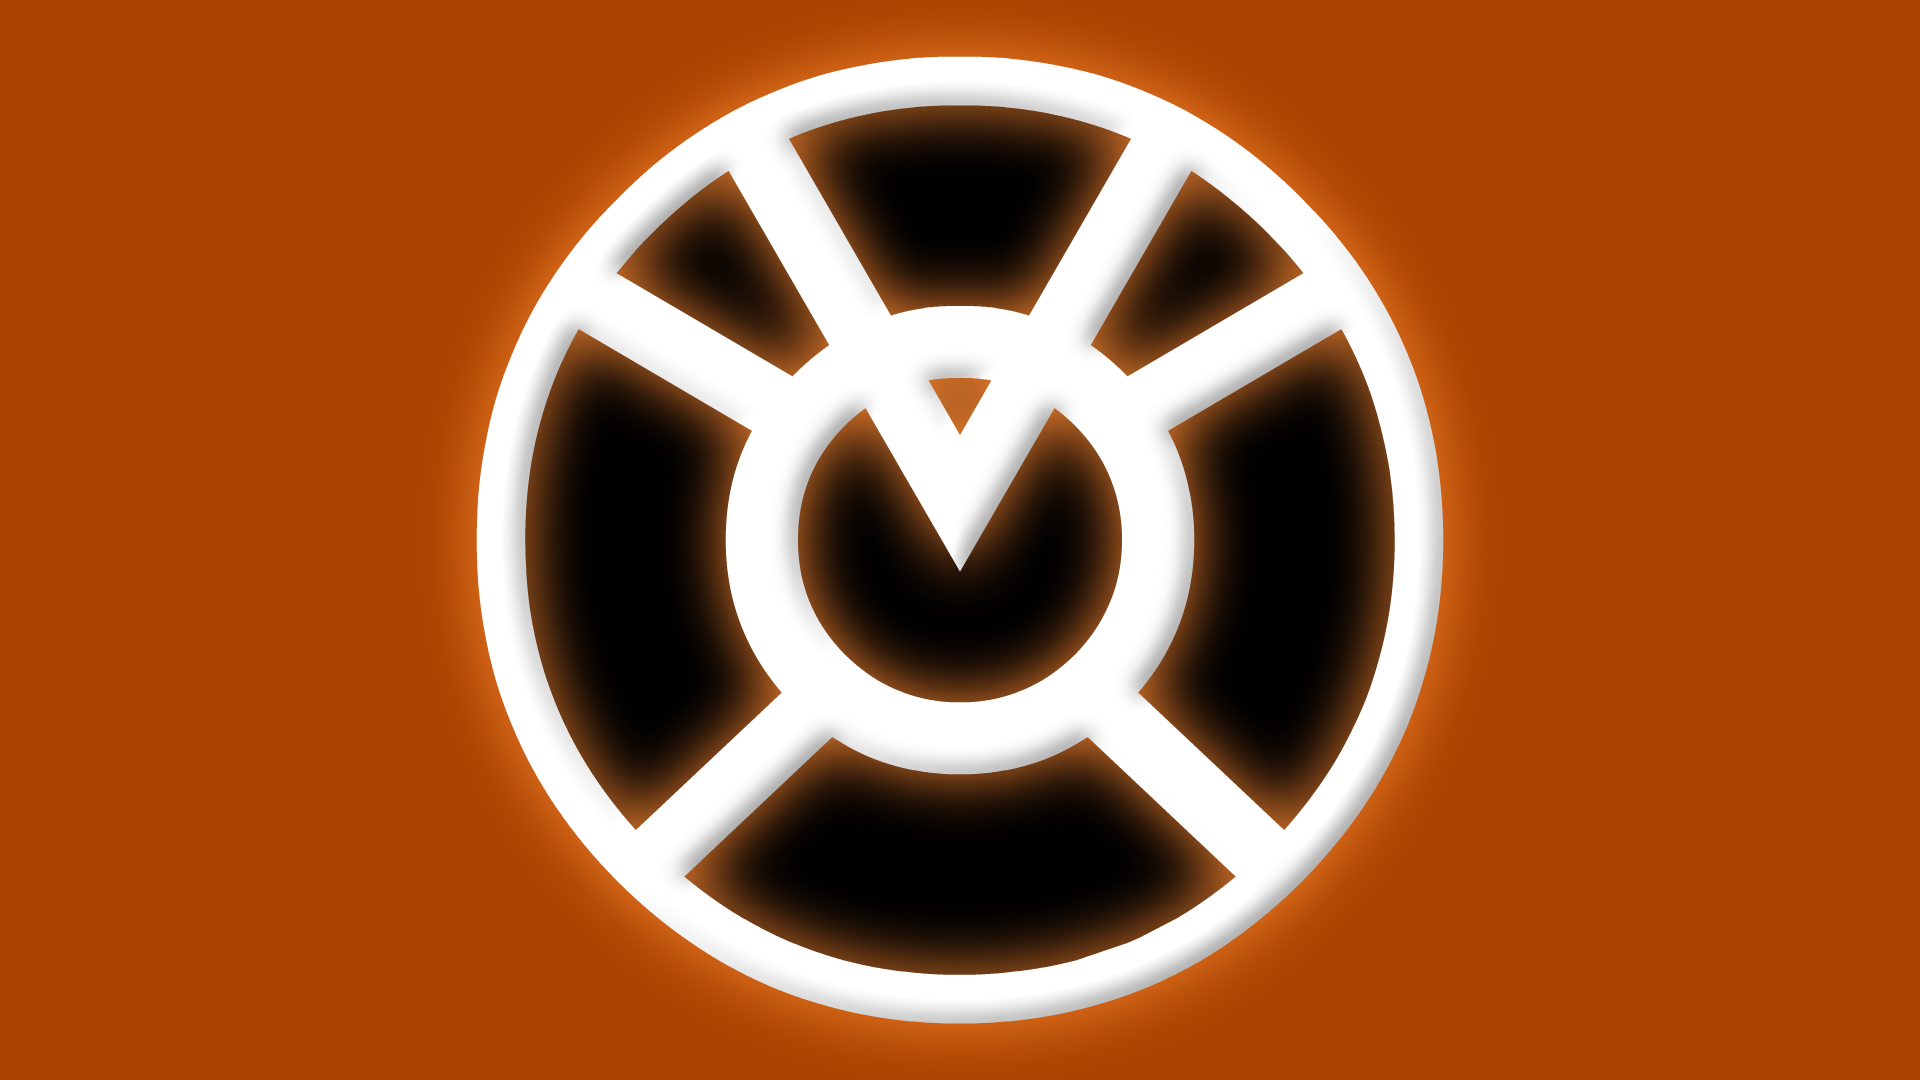 Orange Lantern Symbol by Yurtigo on DeviantArtOrange Lantern Corps Logo